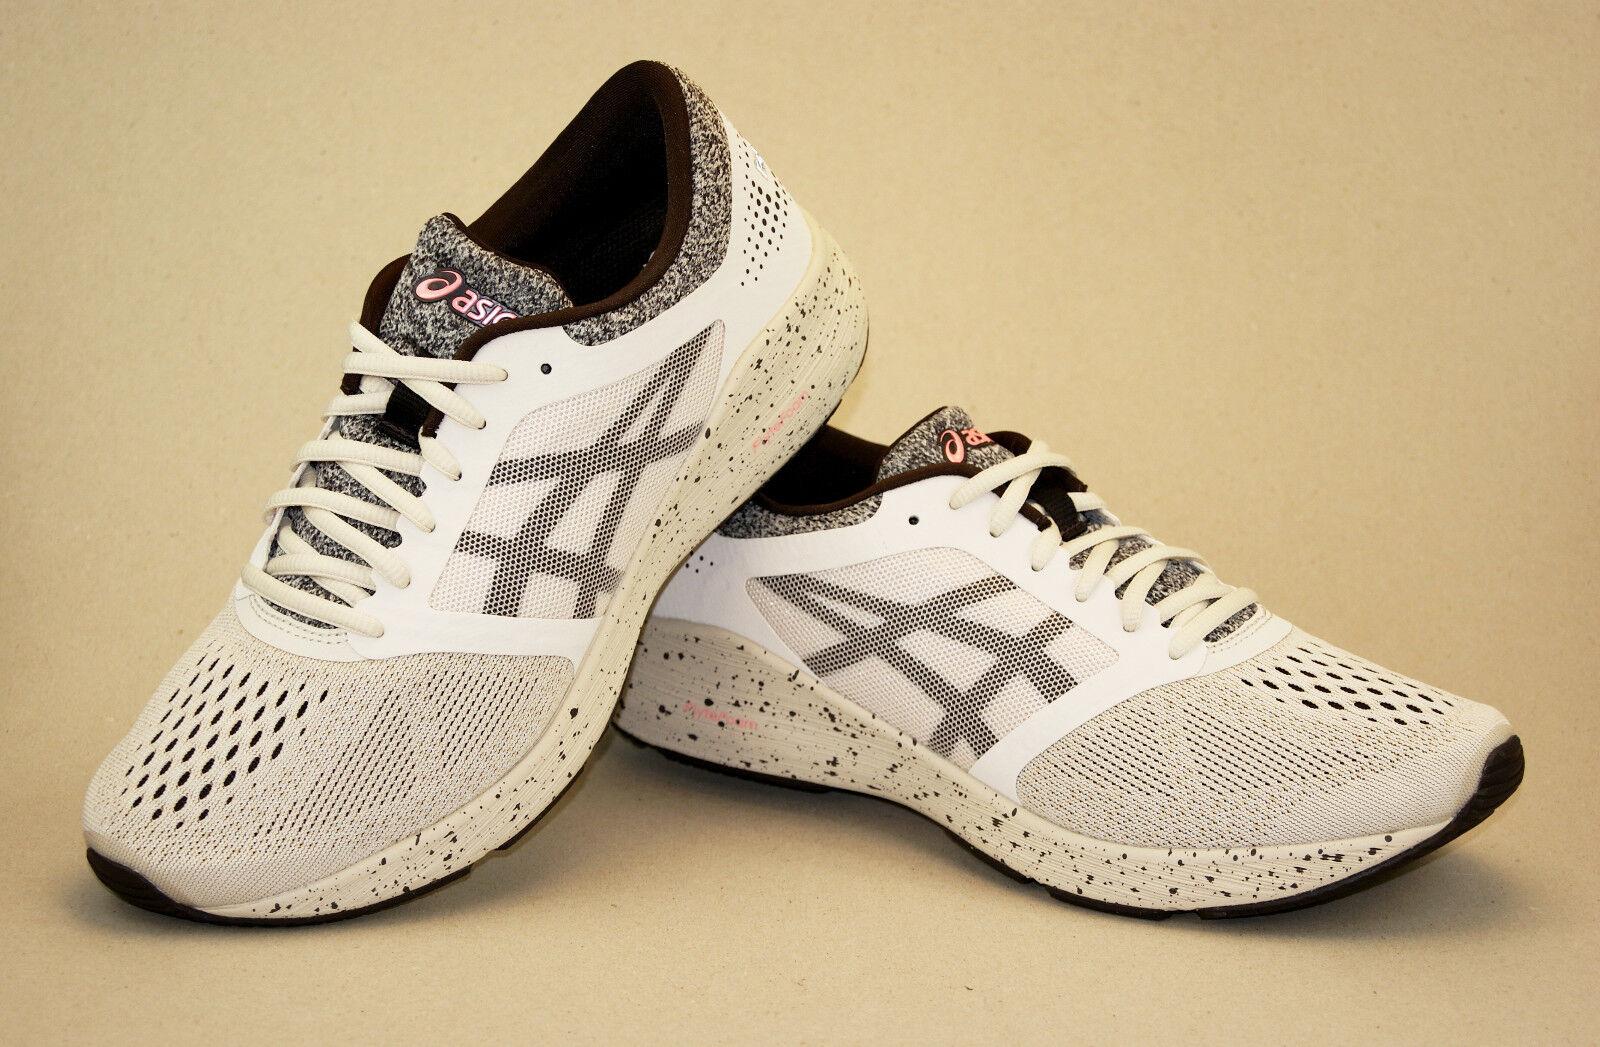 Asics Sakura Roadhawk Ff Sp Running Sports shoes Running Men's T845n-0229